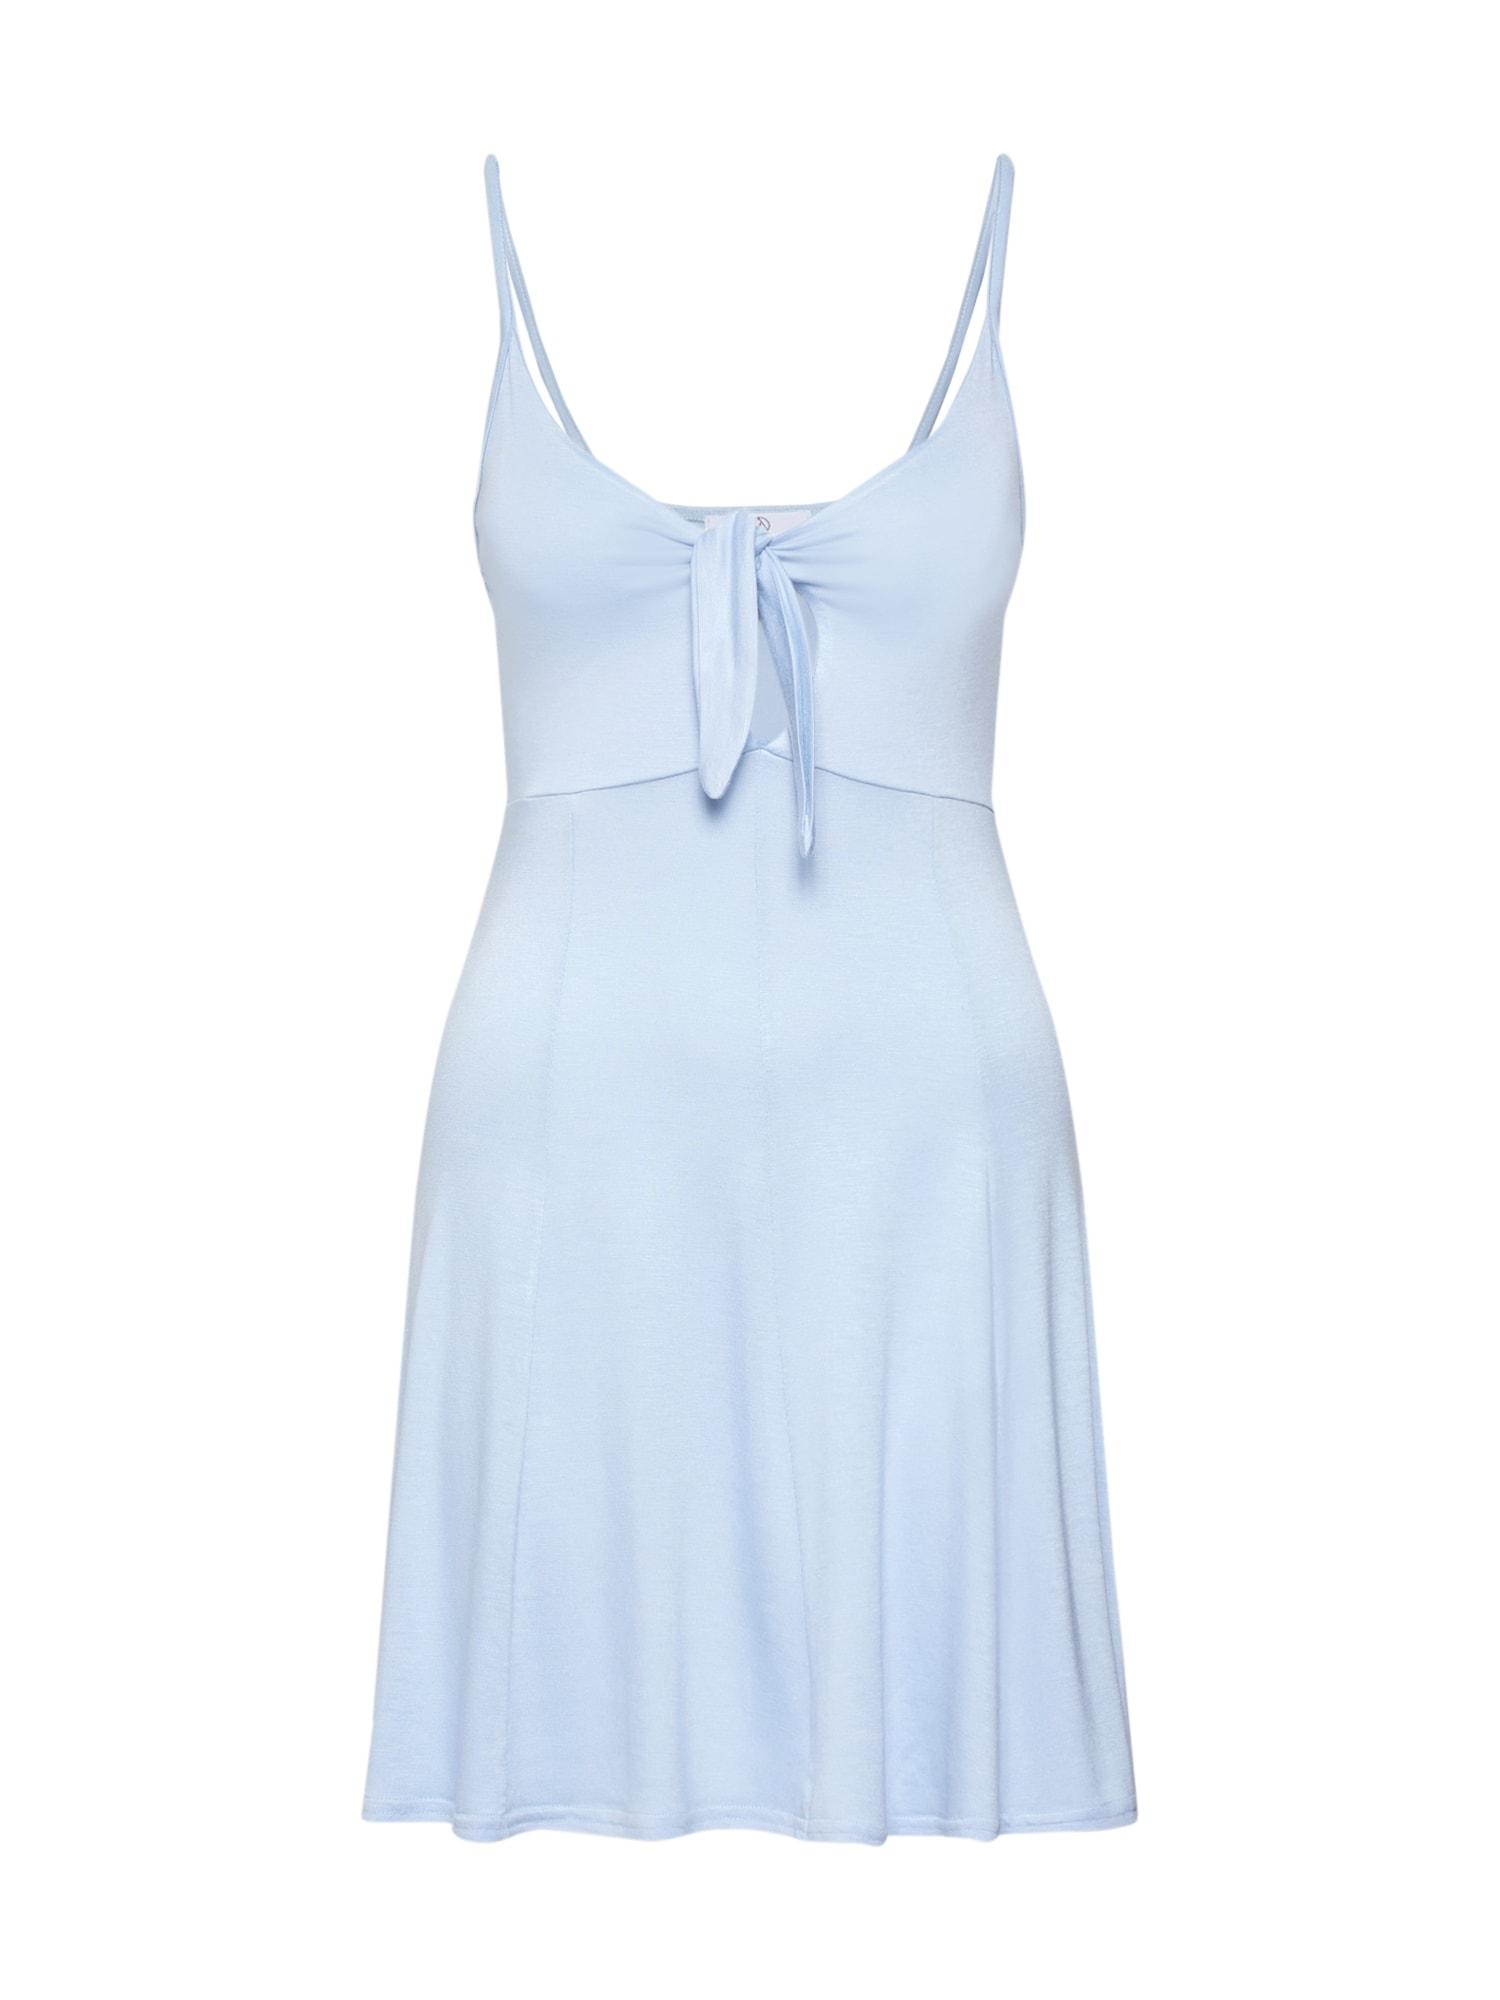 Šaty STRAPPY TIE FRONT SKATER DRESS modrá Missguided